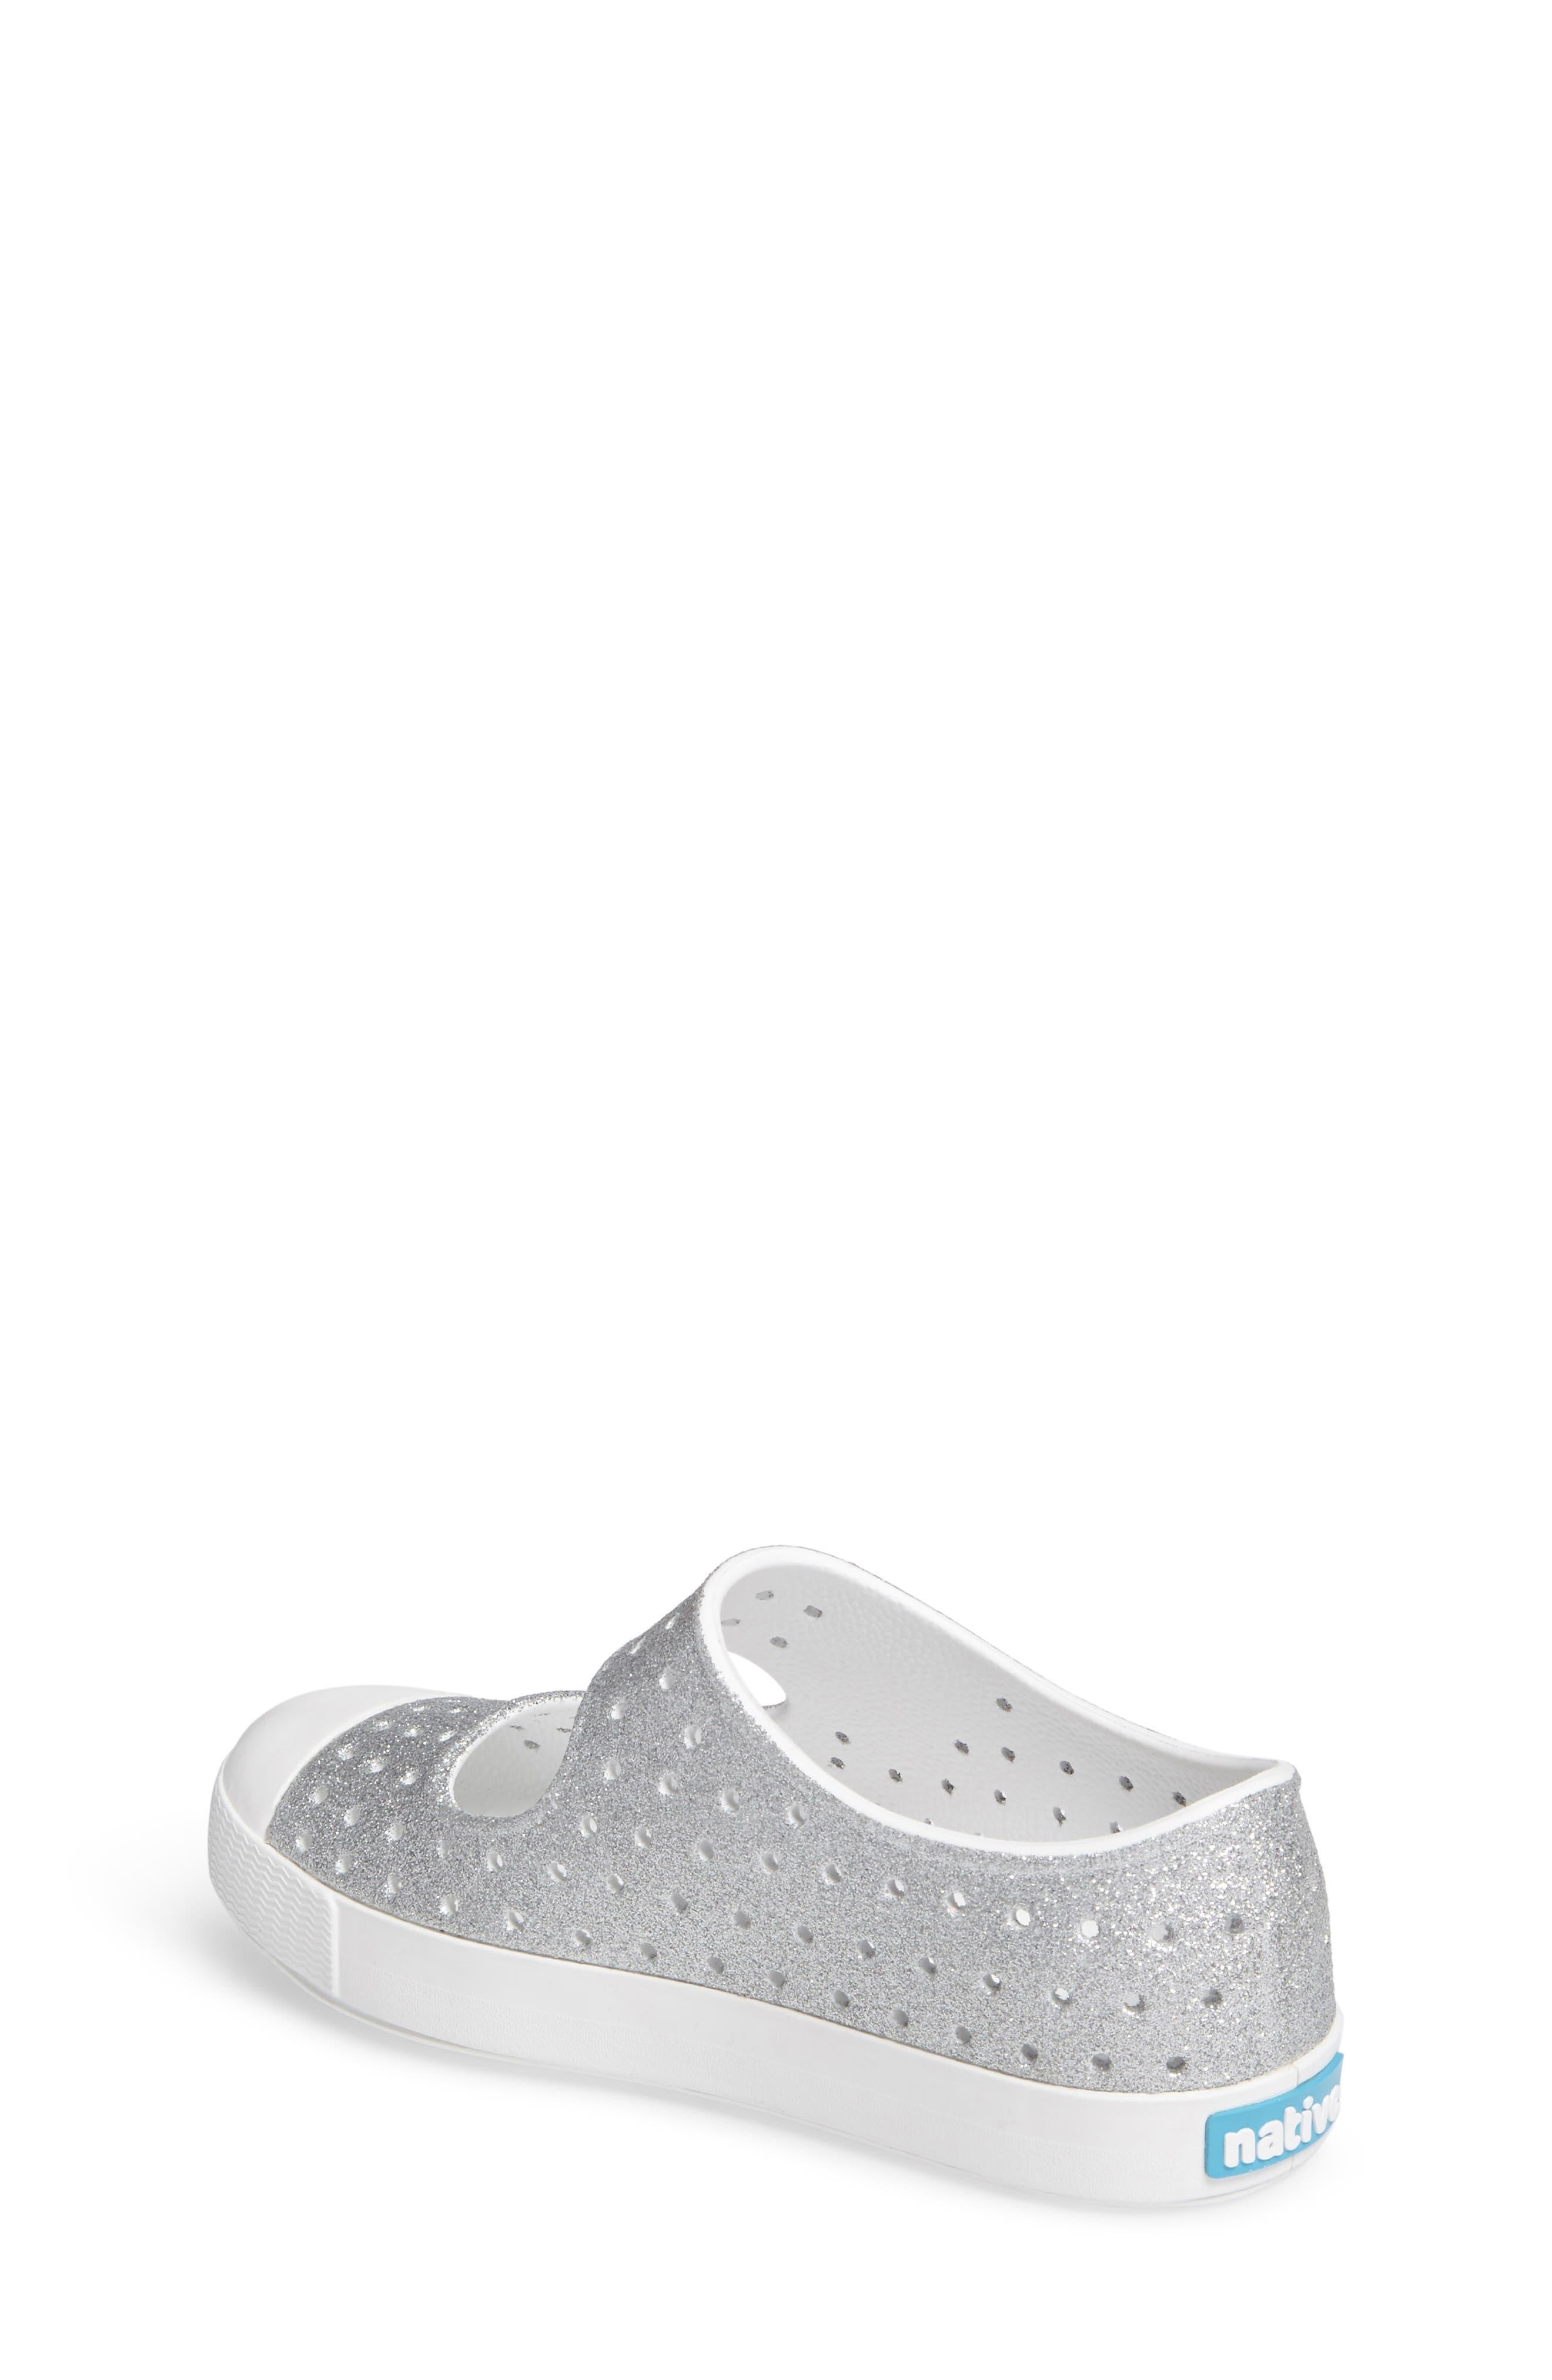 Alternate Image 2  - Native Shoes Juniper Bling Perforated Mary Jane (Baby, Walker, Toddler & Little Kid)